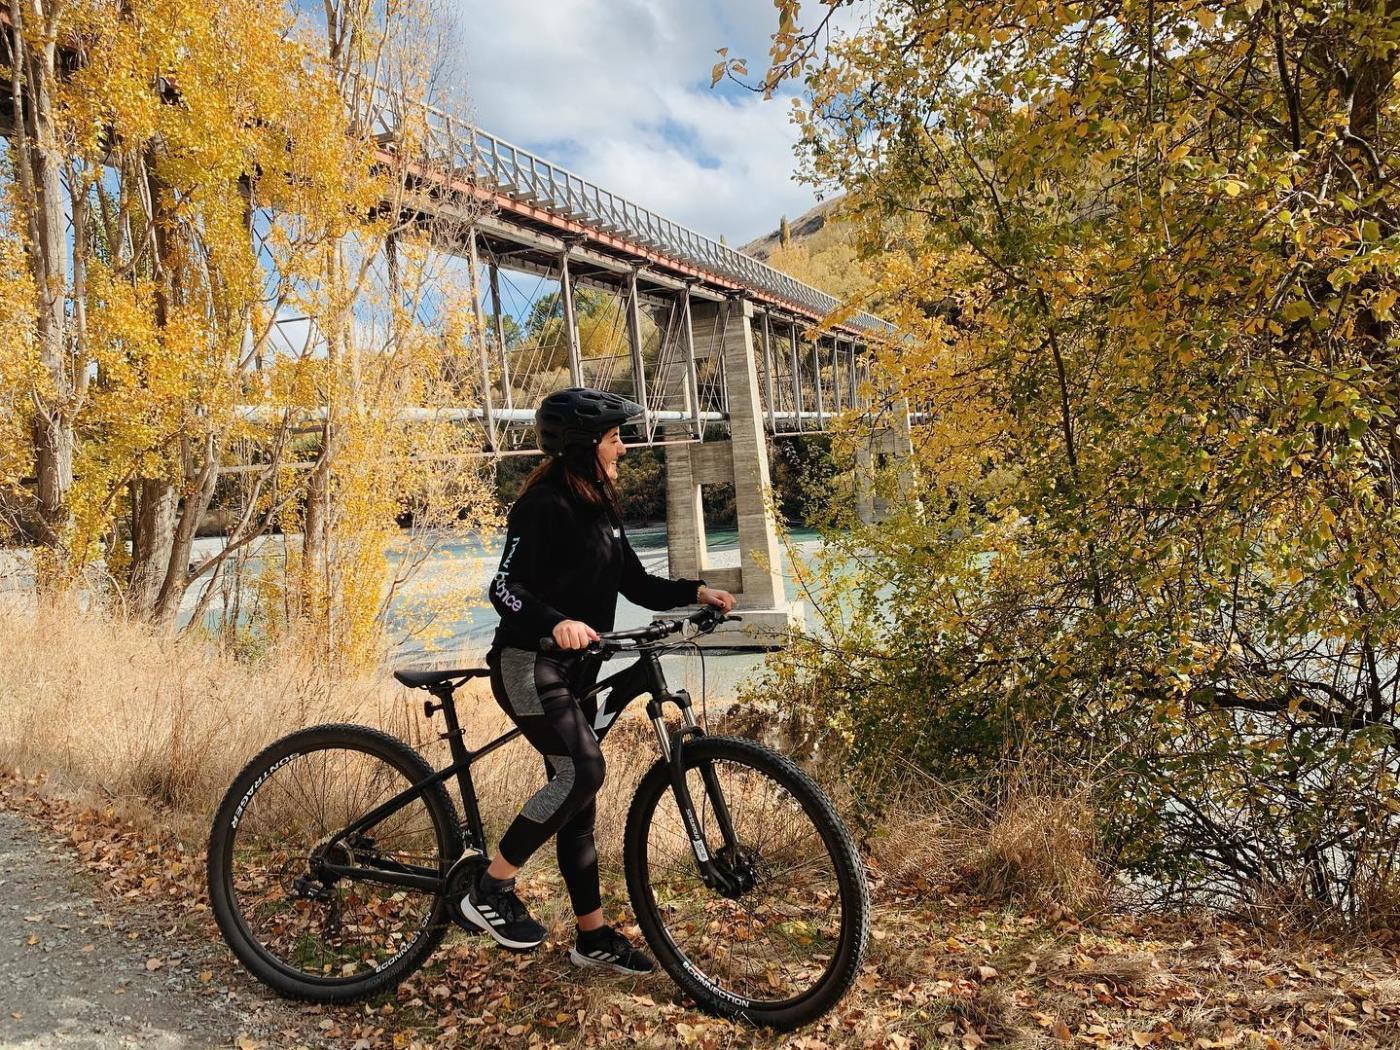 Biking the Twin Rivers Trail in Autumn, beside the Lower Shotover Bridge